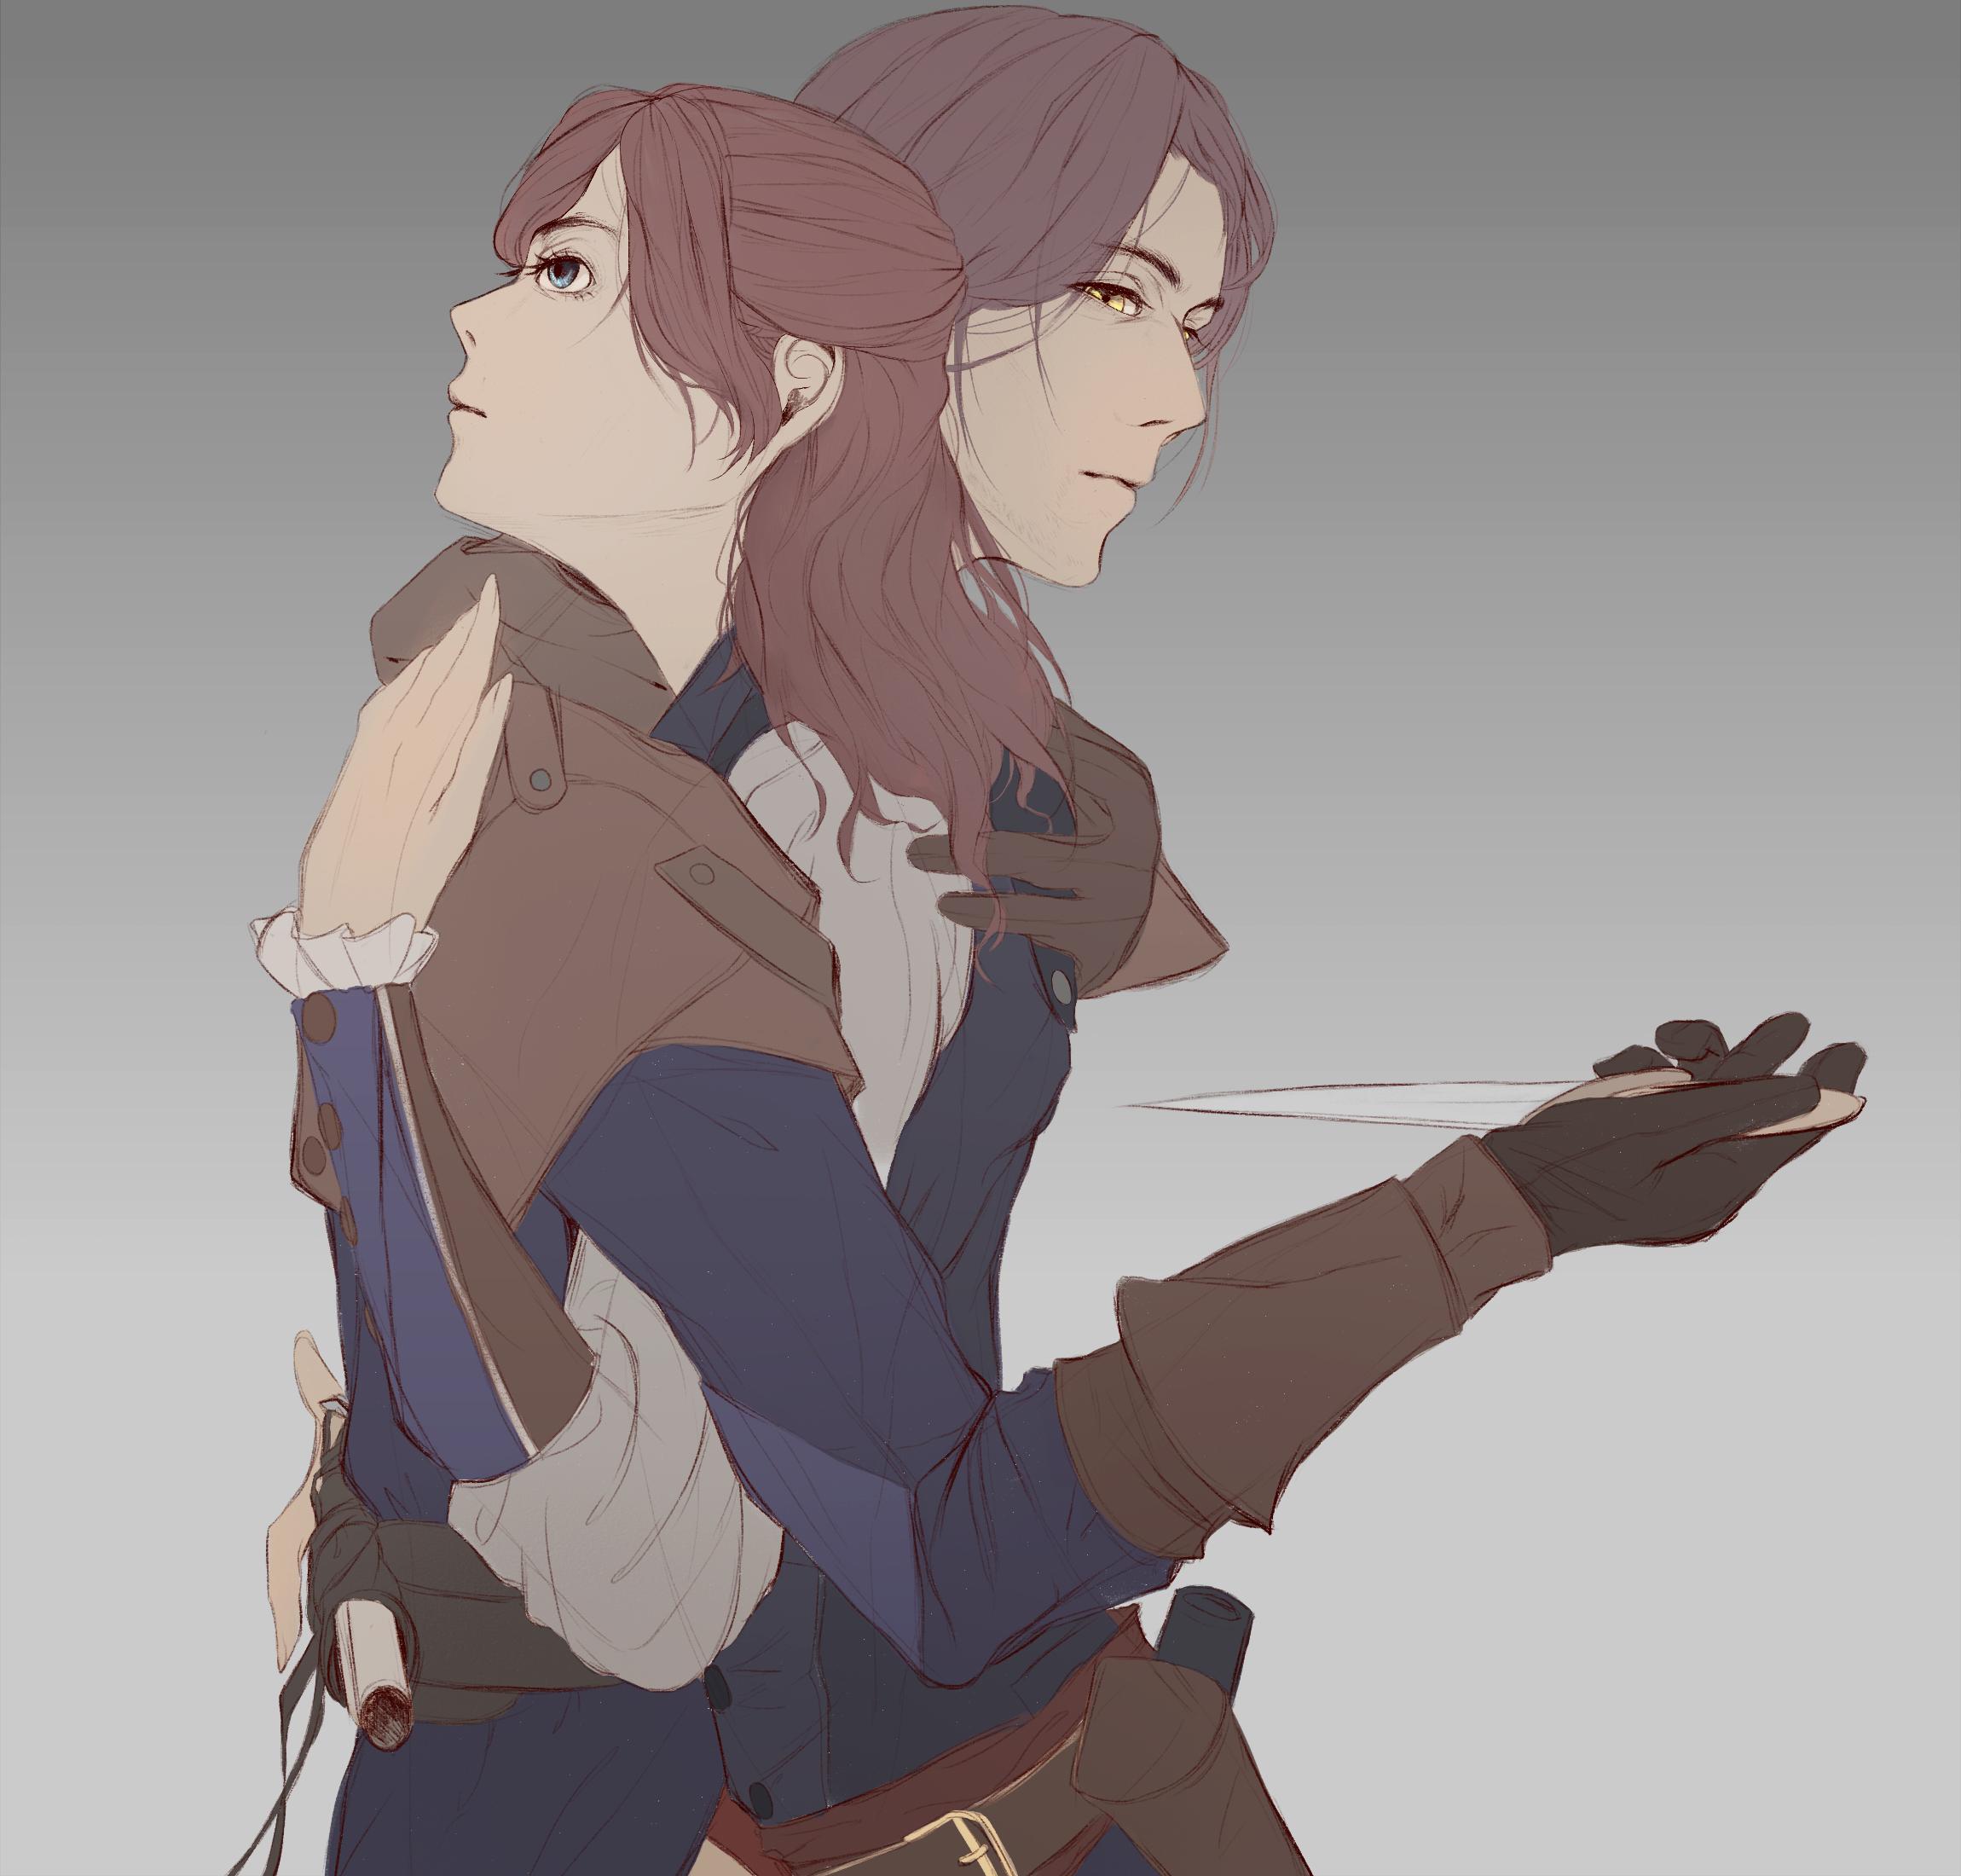 Anime Characters Unity : Assassin s creed unity image zerochan anime